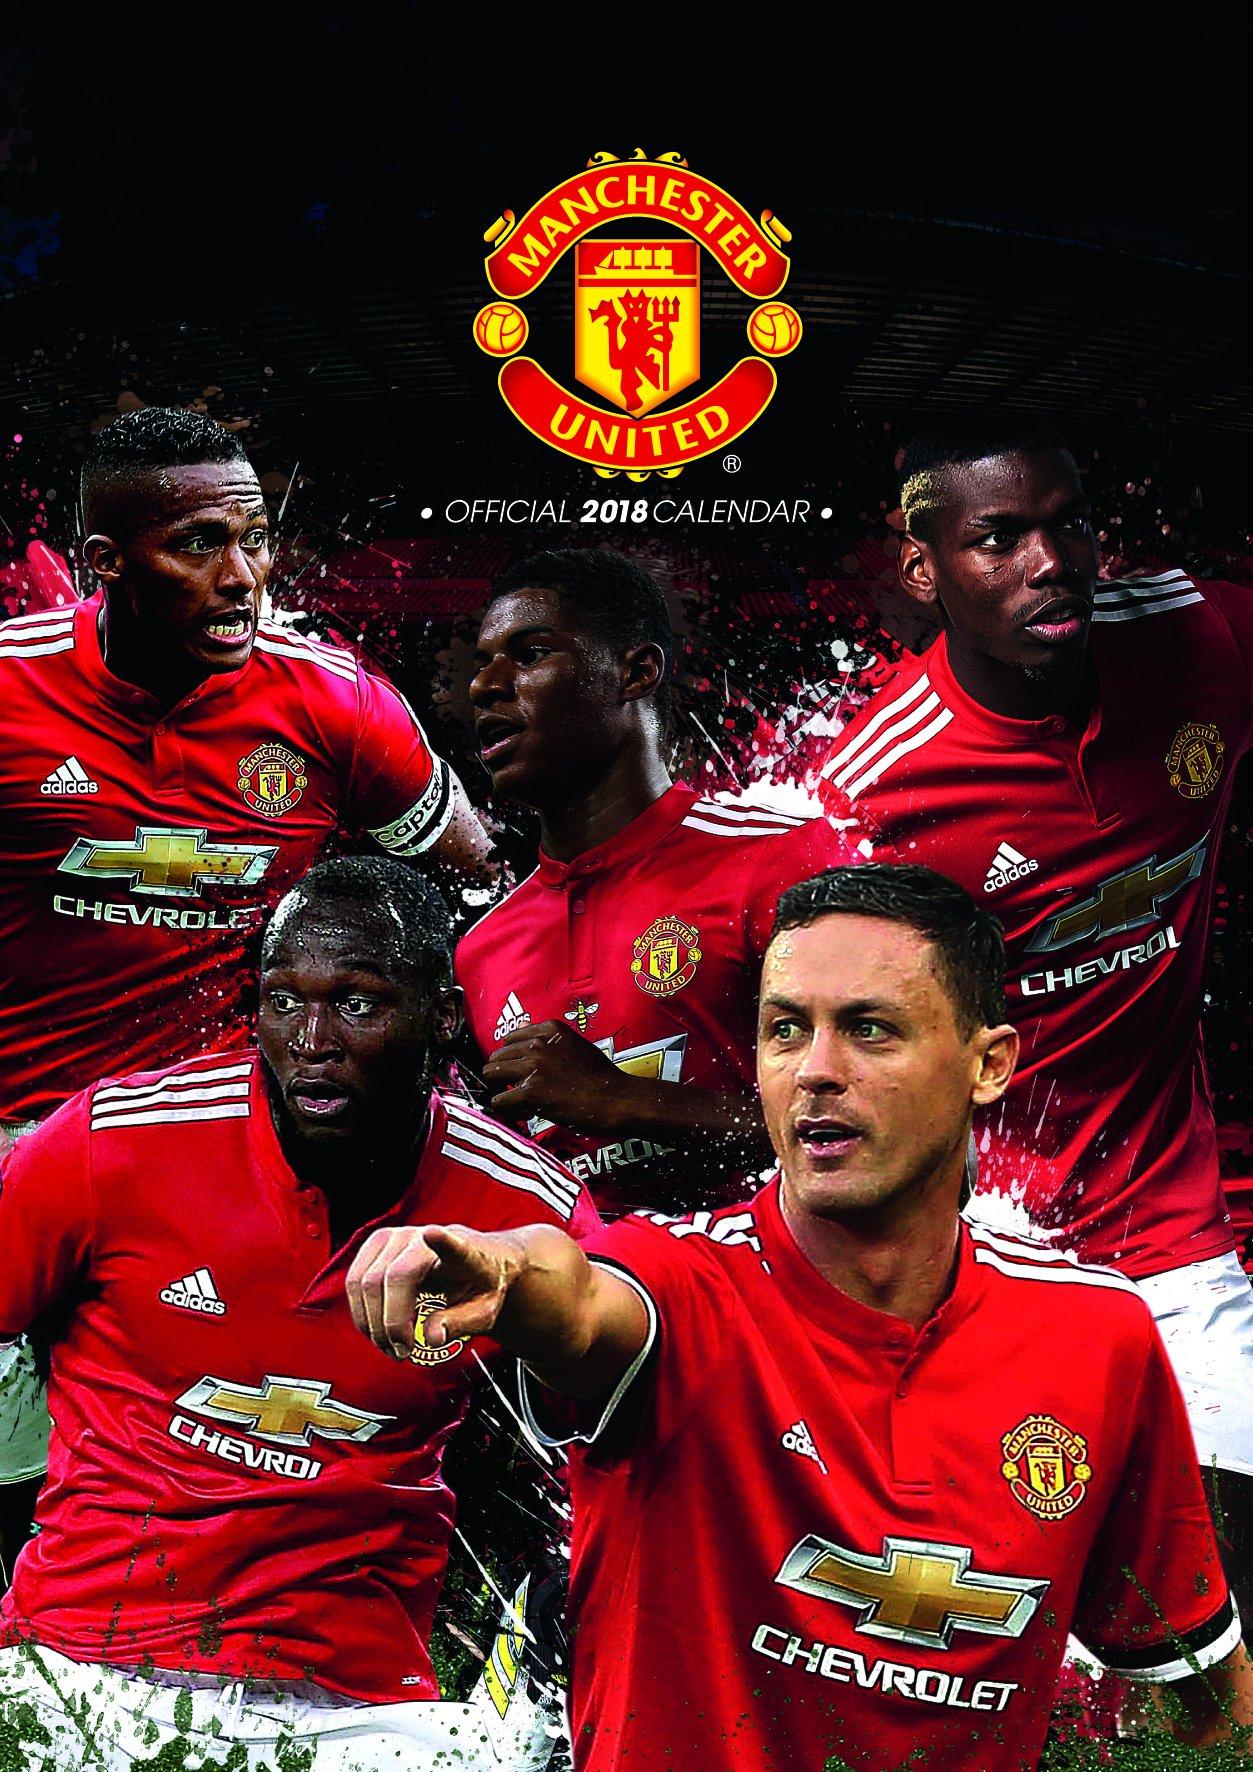 Manchester United Ficial 2018 Calendar A3 Poster Format